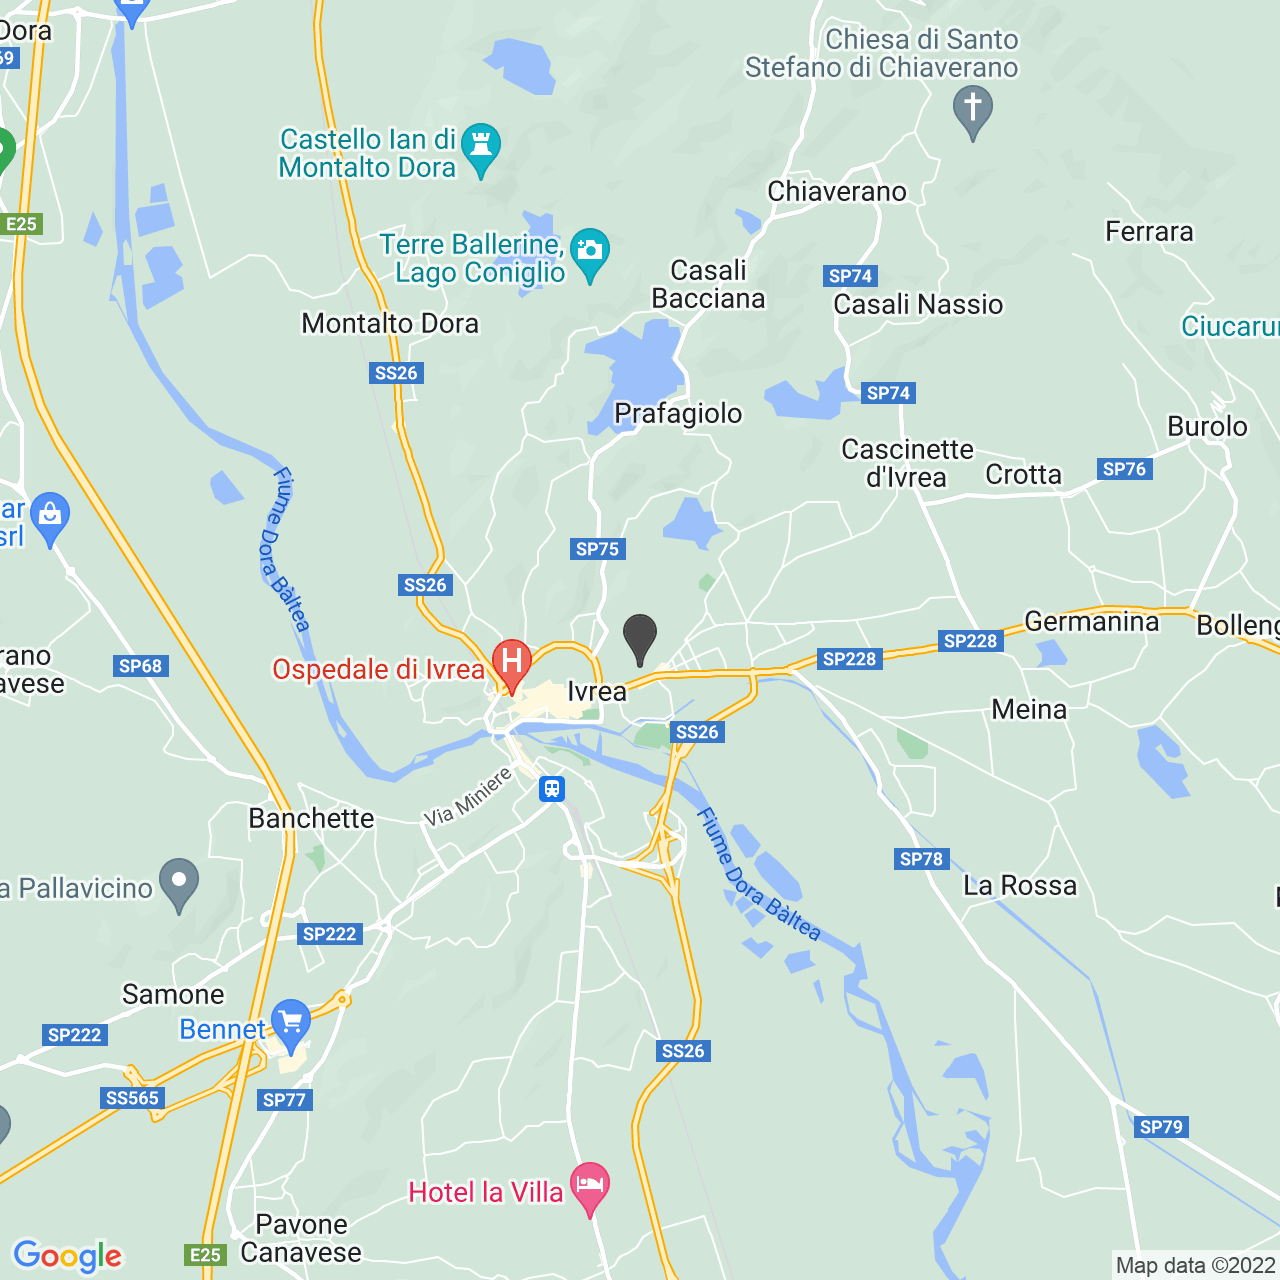 ASSOCIAZIONE ORCHESTRA SINFONICA GIOVANILE DEL PIEMONTE -ONLUS